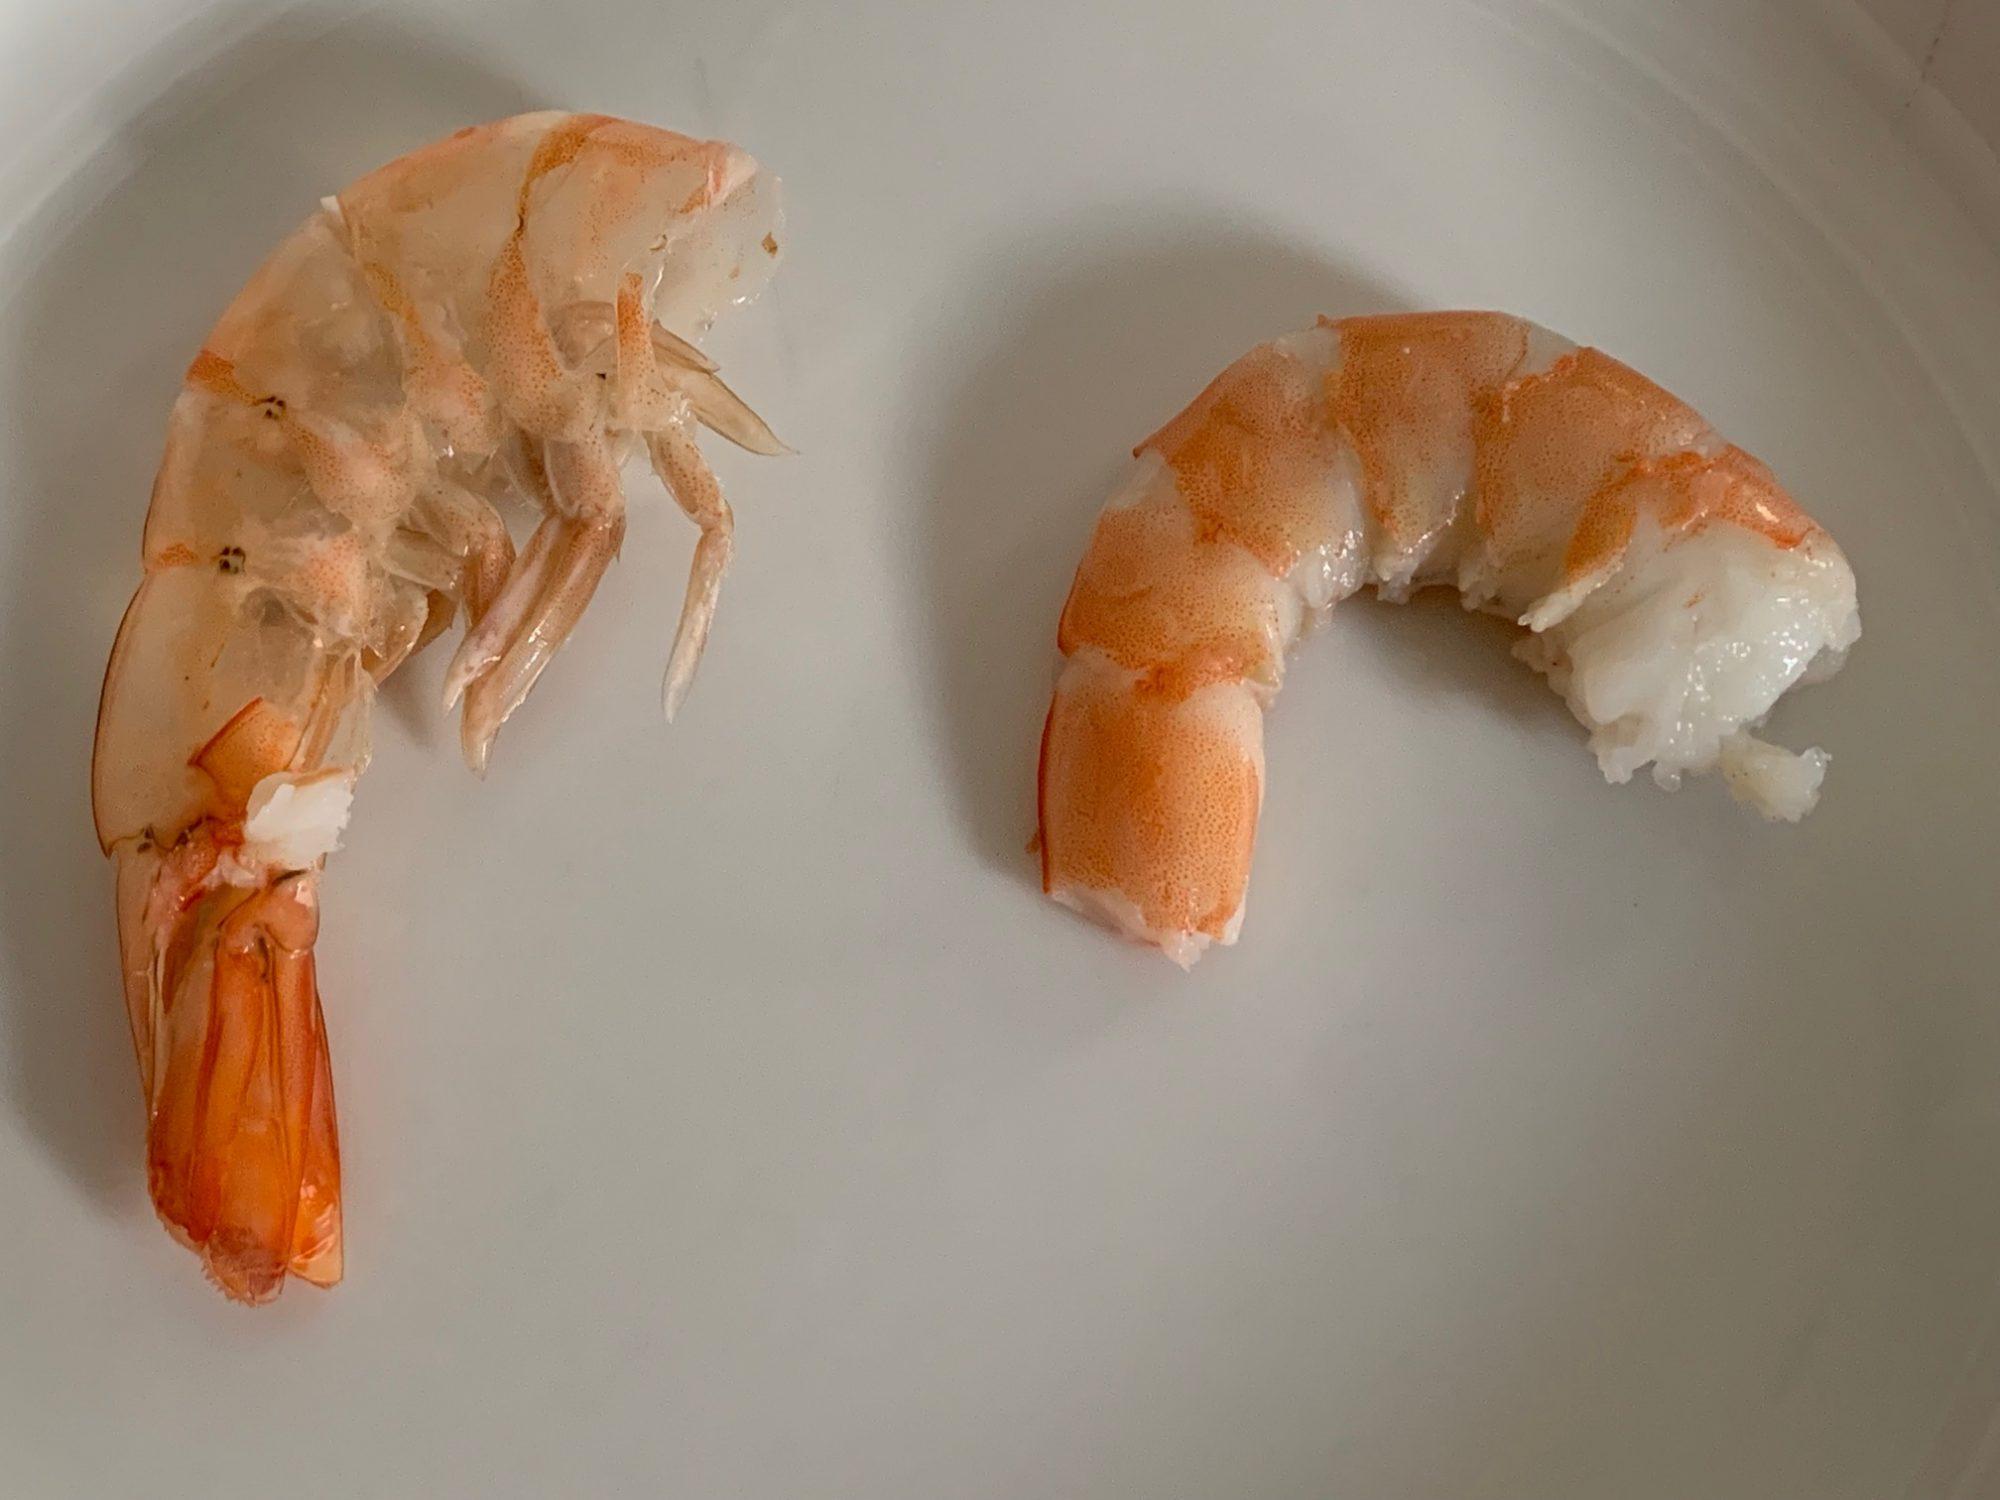 peeled cooked shrimp